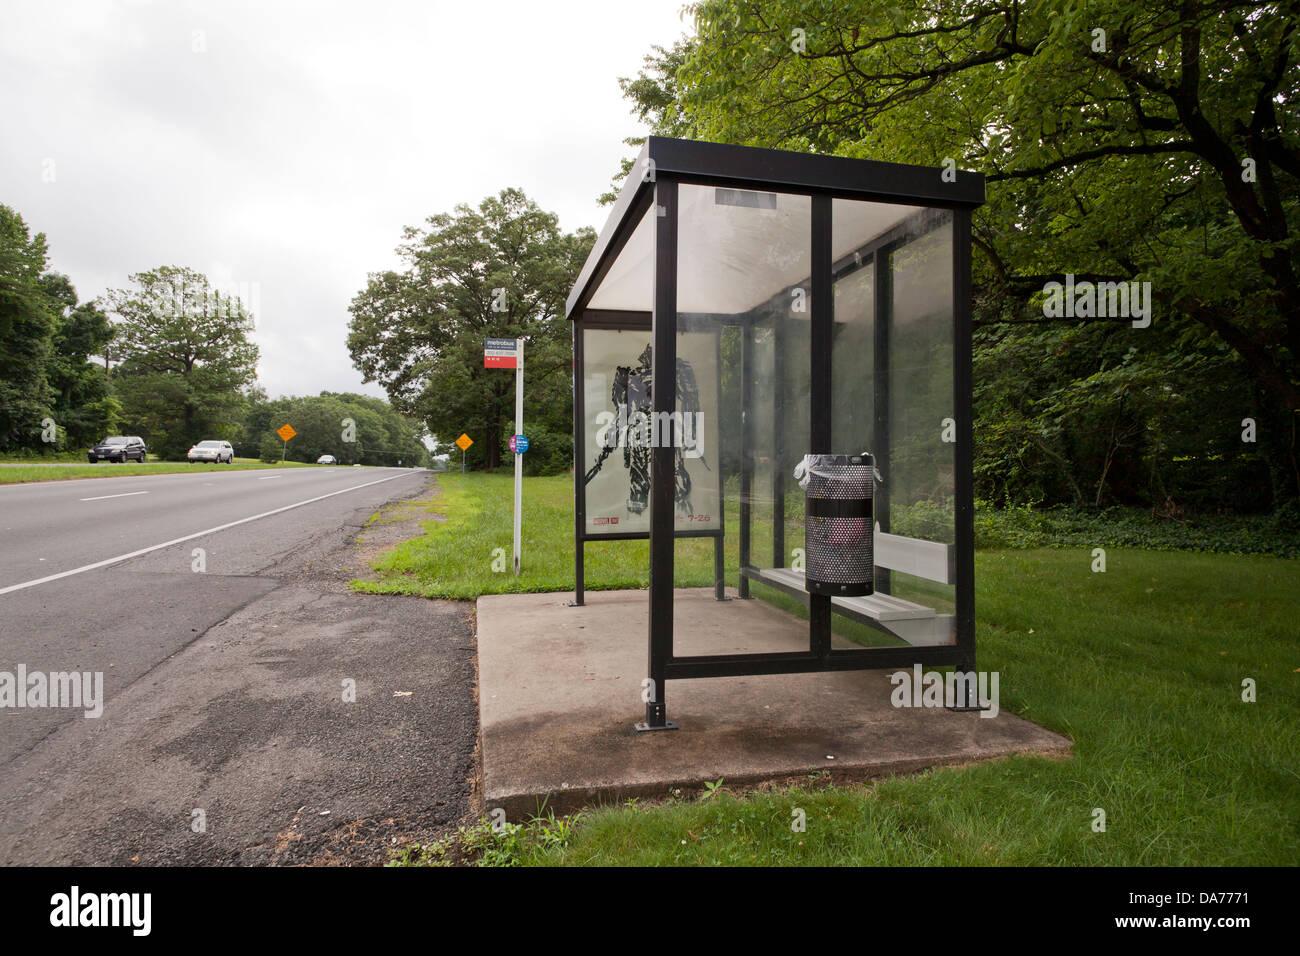 Enclosed bus shelter - Virginia, USA - Stock Image